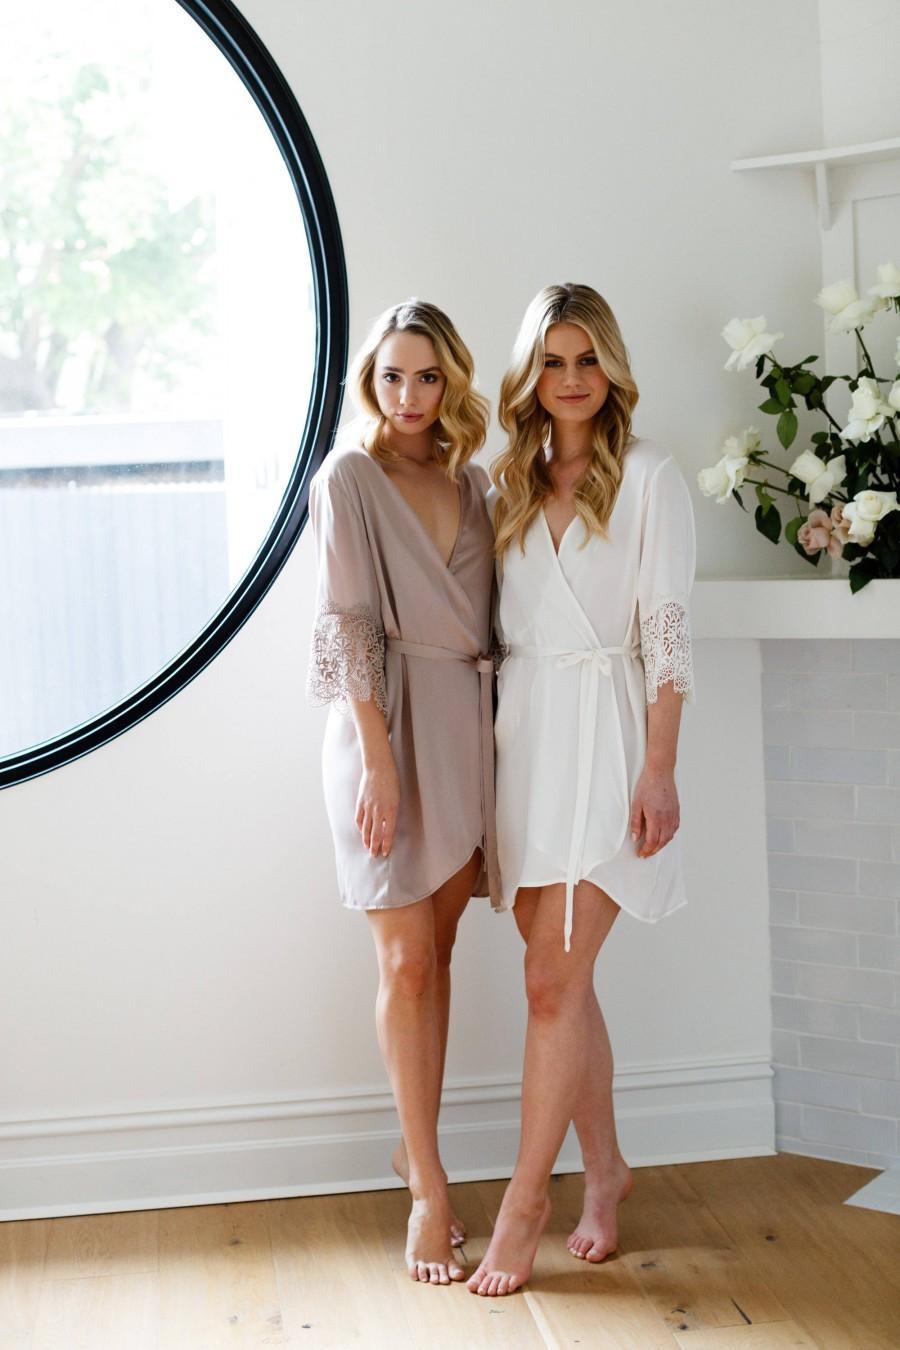 Свадьба - Silk Bridal Robe // Bridesmaid Robes // Robe // Bridal Robe // Bride Robe // Bridal Party Robes // Bridesmaid Gifts / Silk